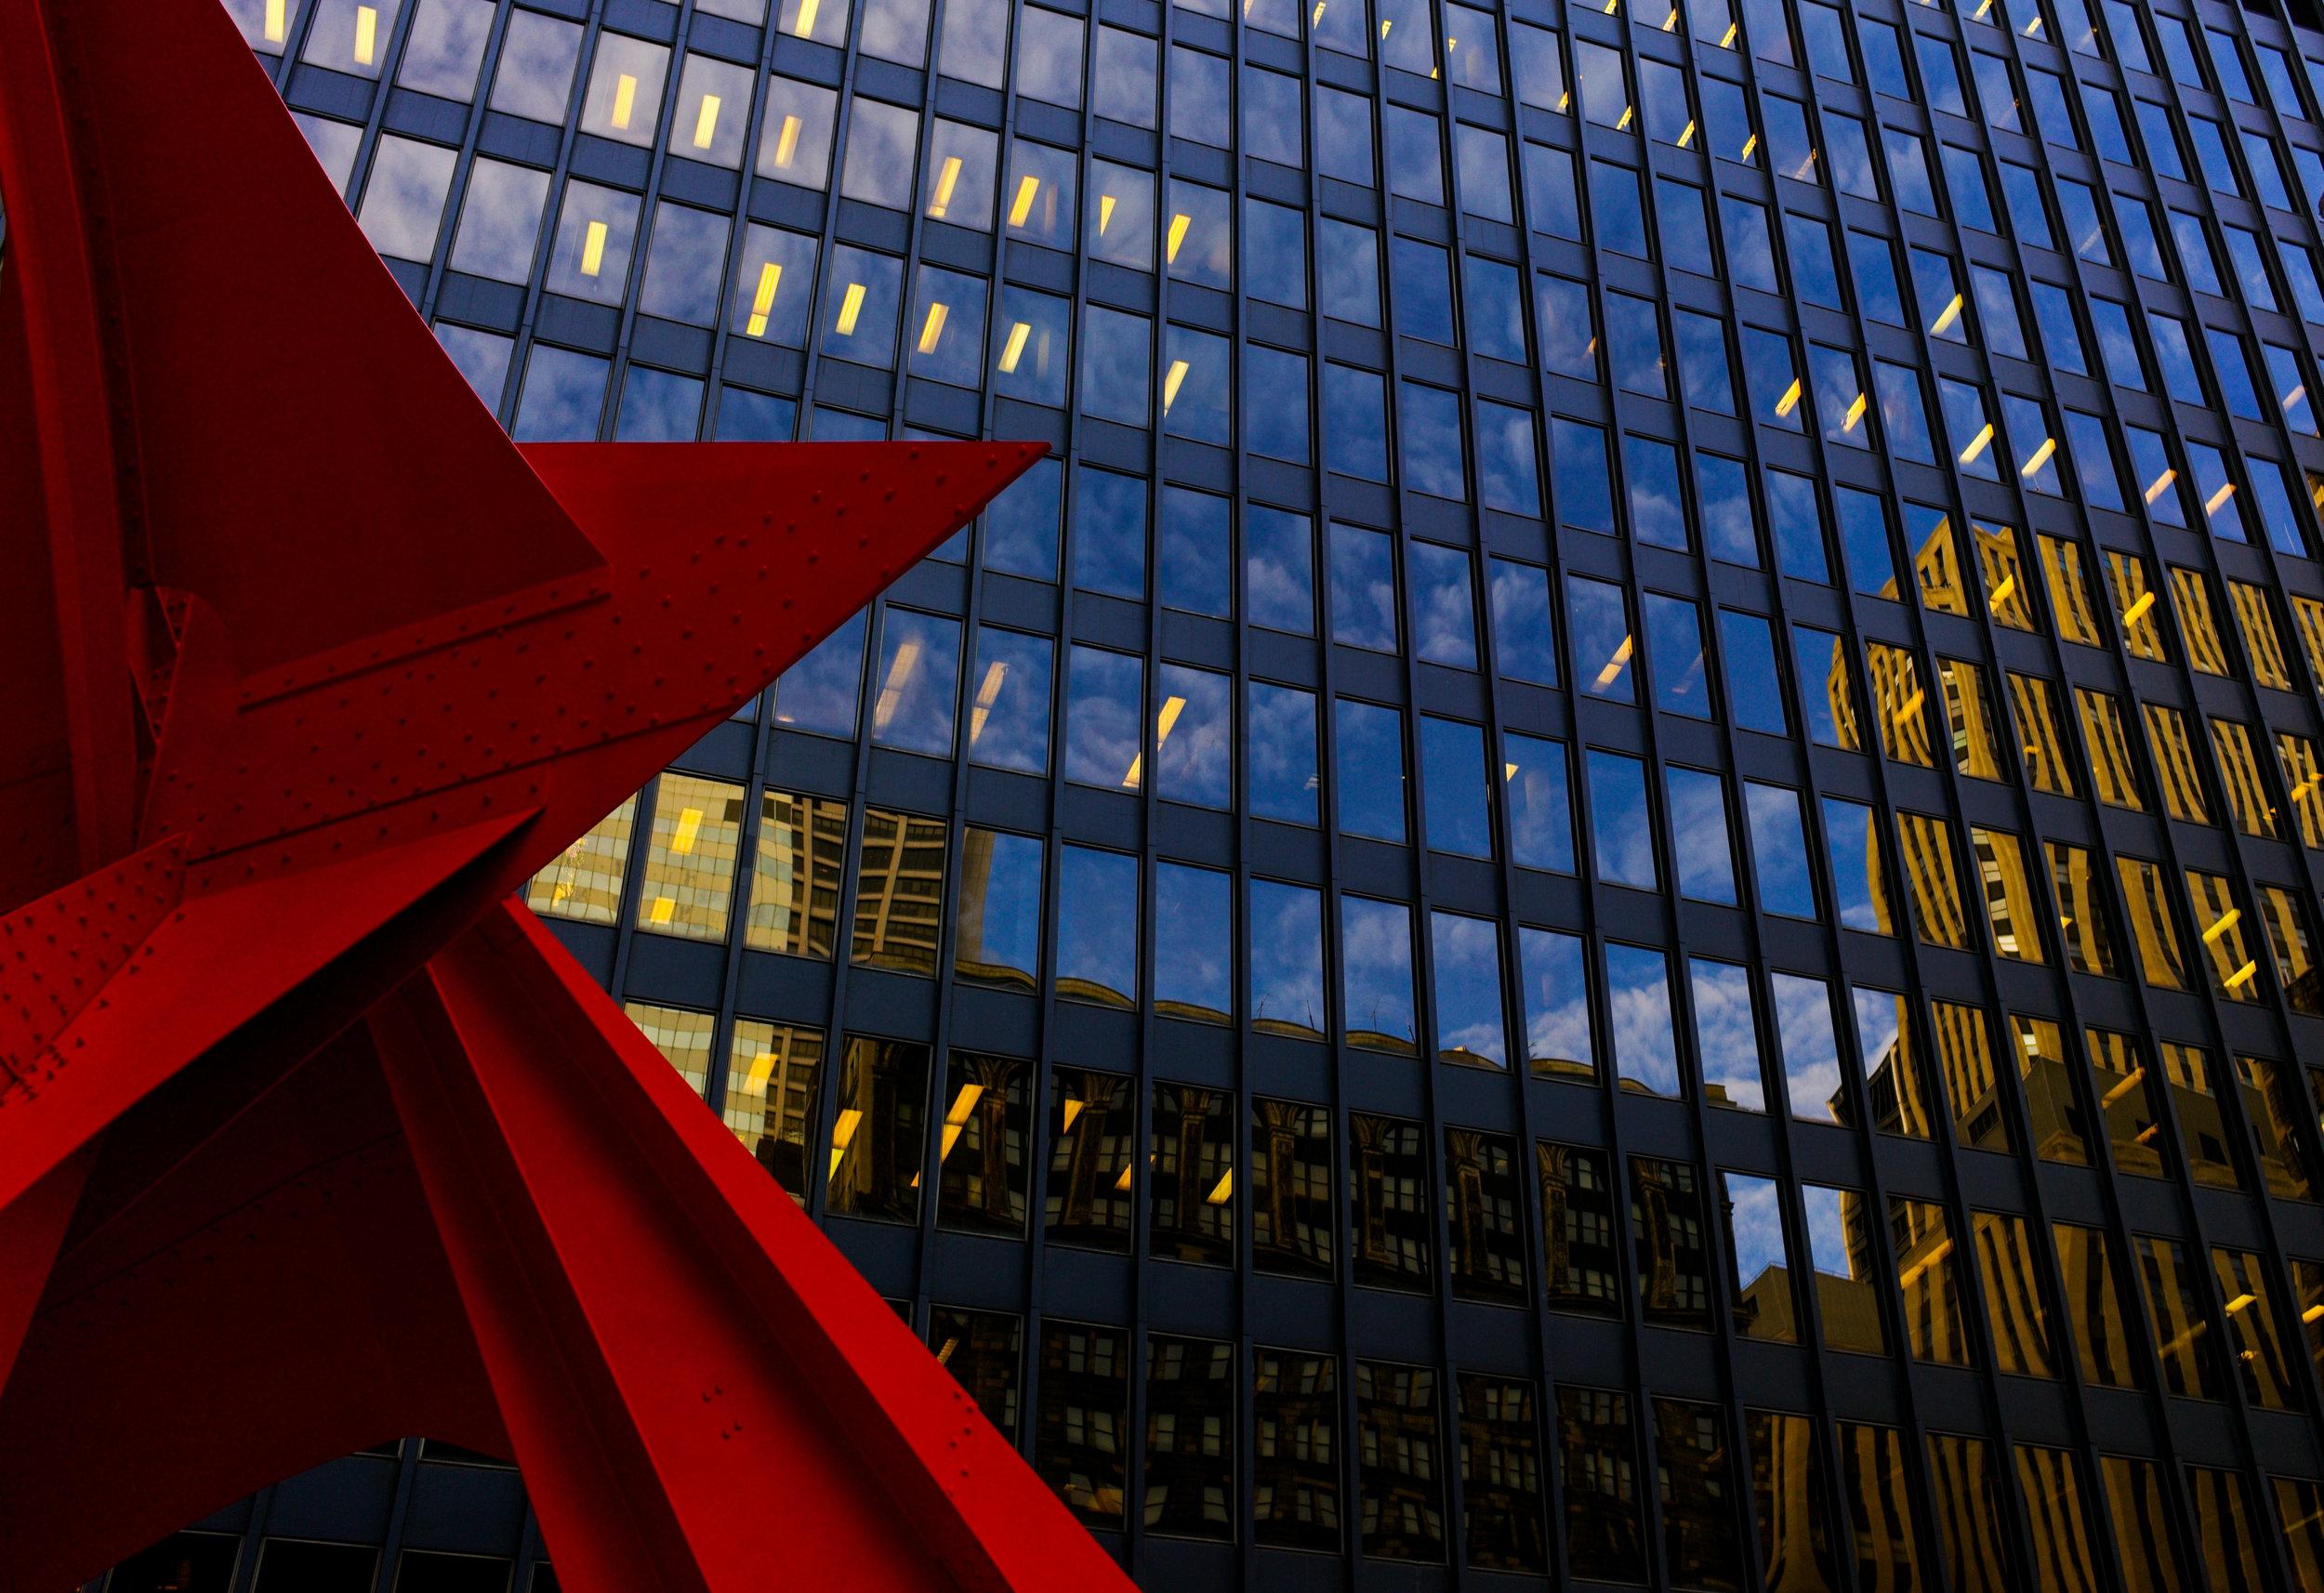 Calder/Federal Center